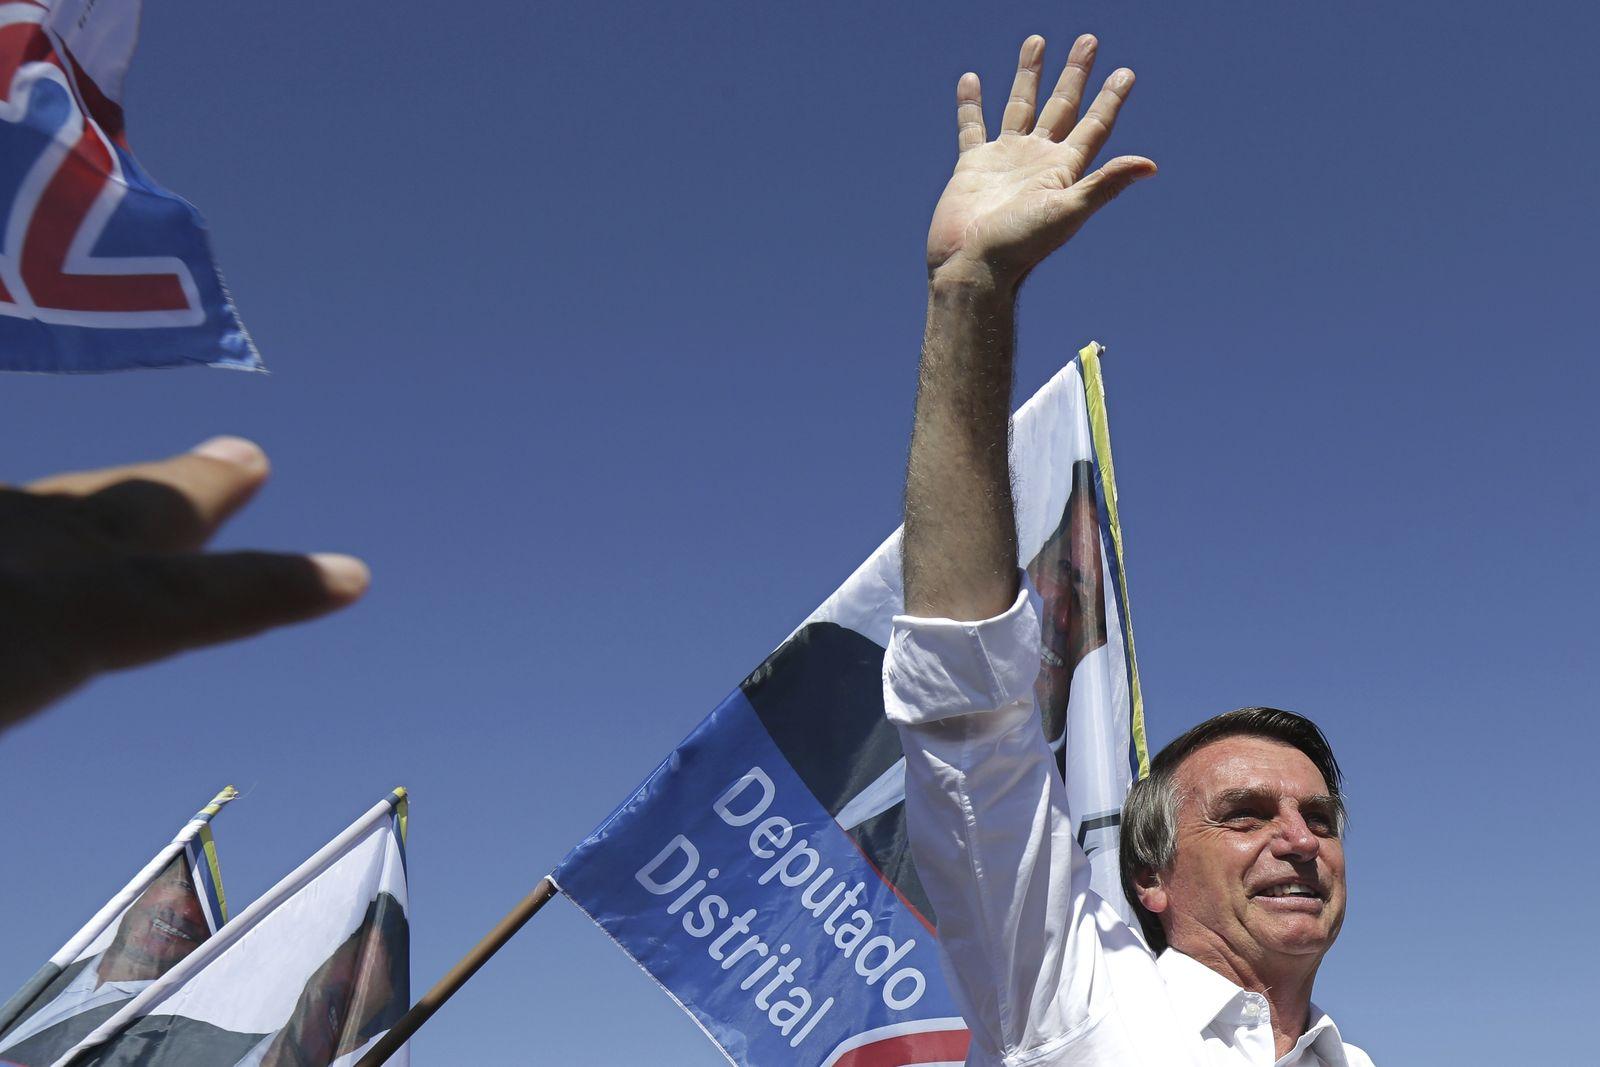 Vor der Wahl in Brasilien - Jair Bolsonaro